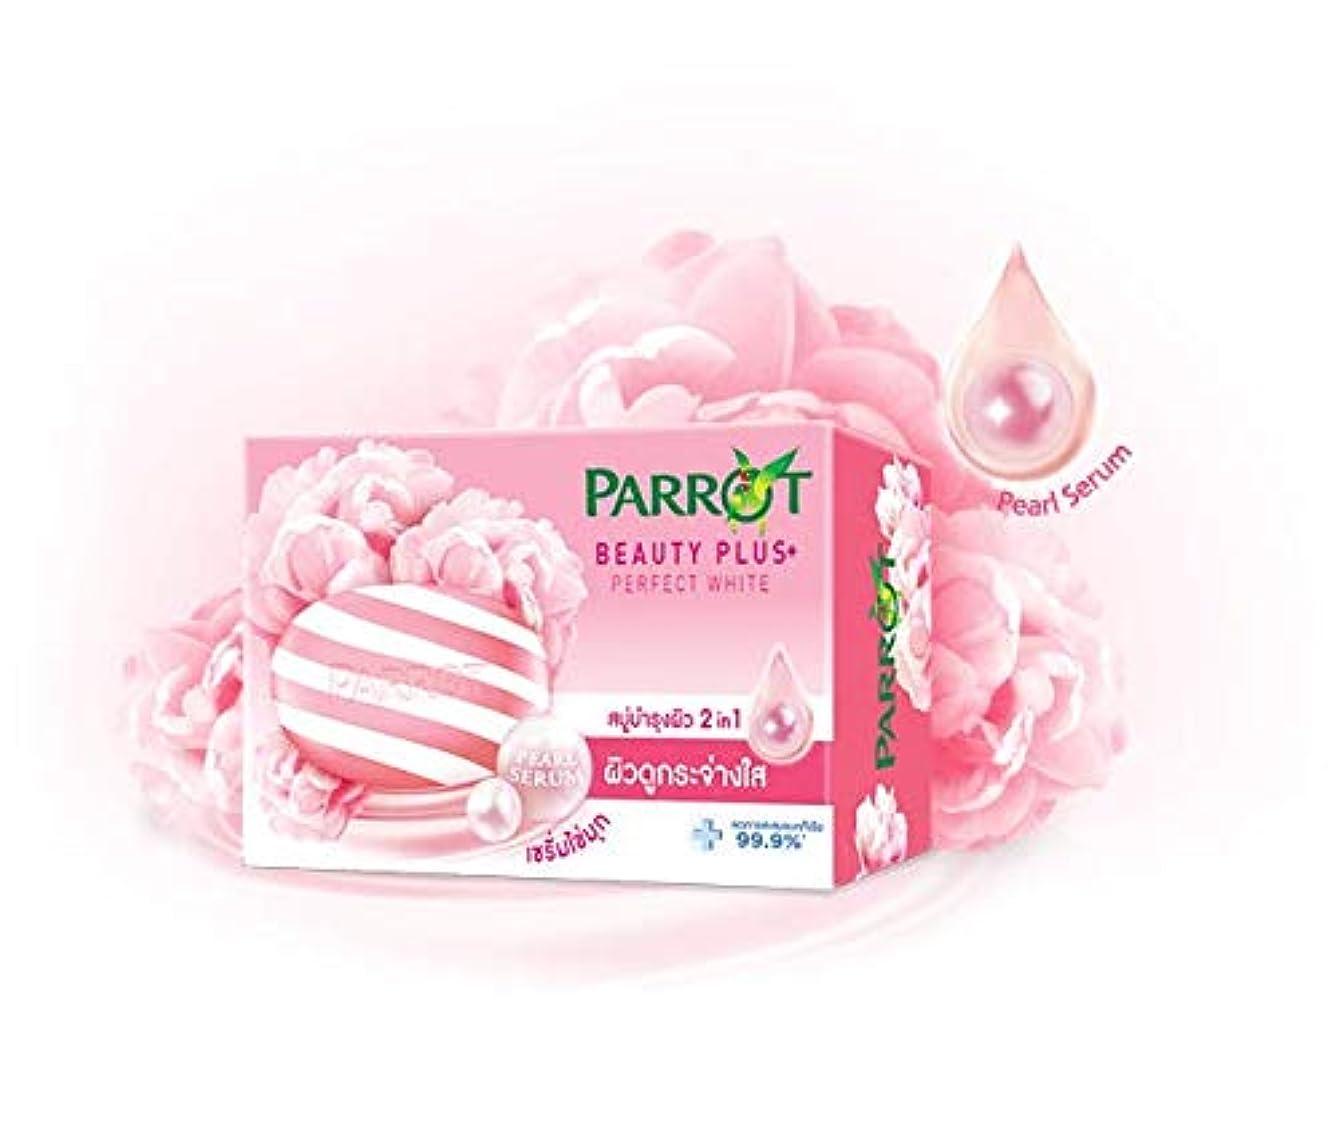 Parrot Soap Reduce 99.9% bacteria accumulation Beauty Plus Perpect White (95 g x 4)